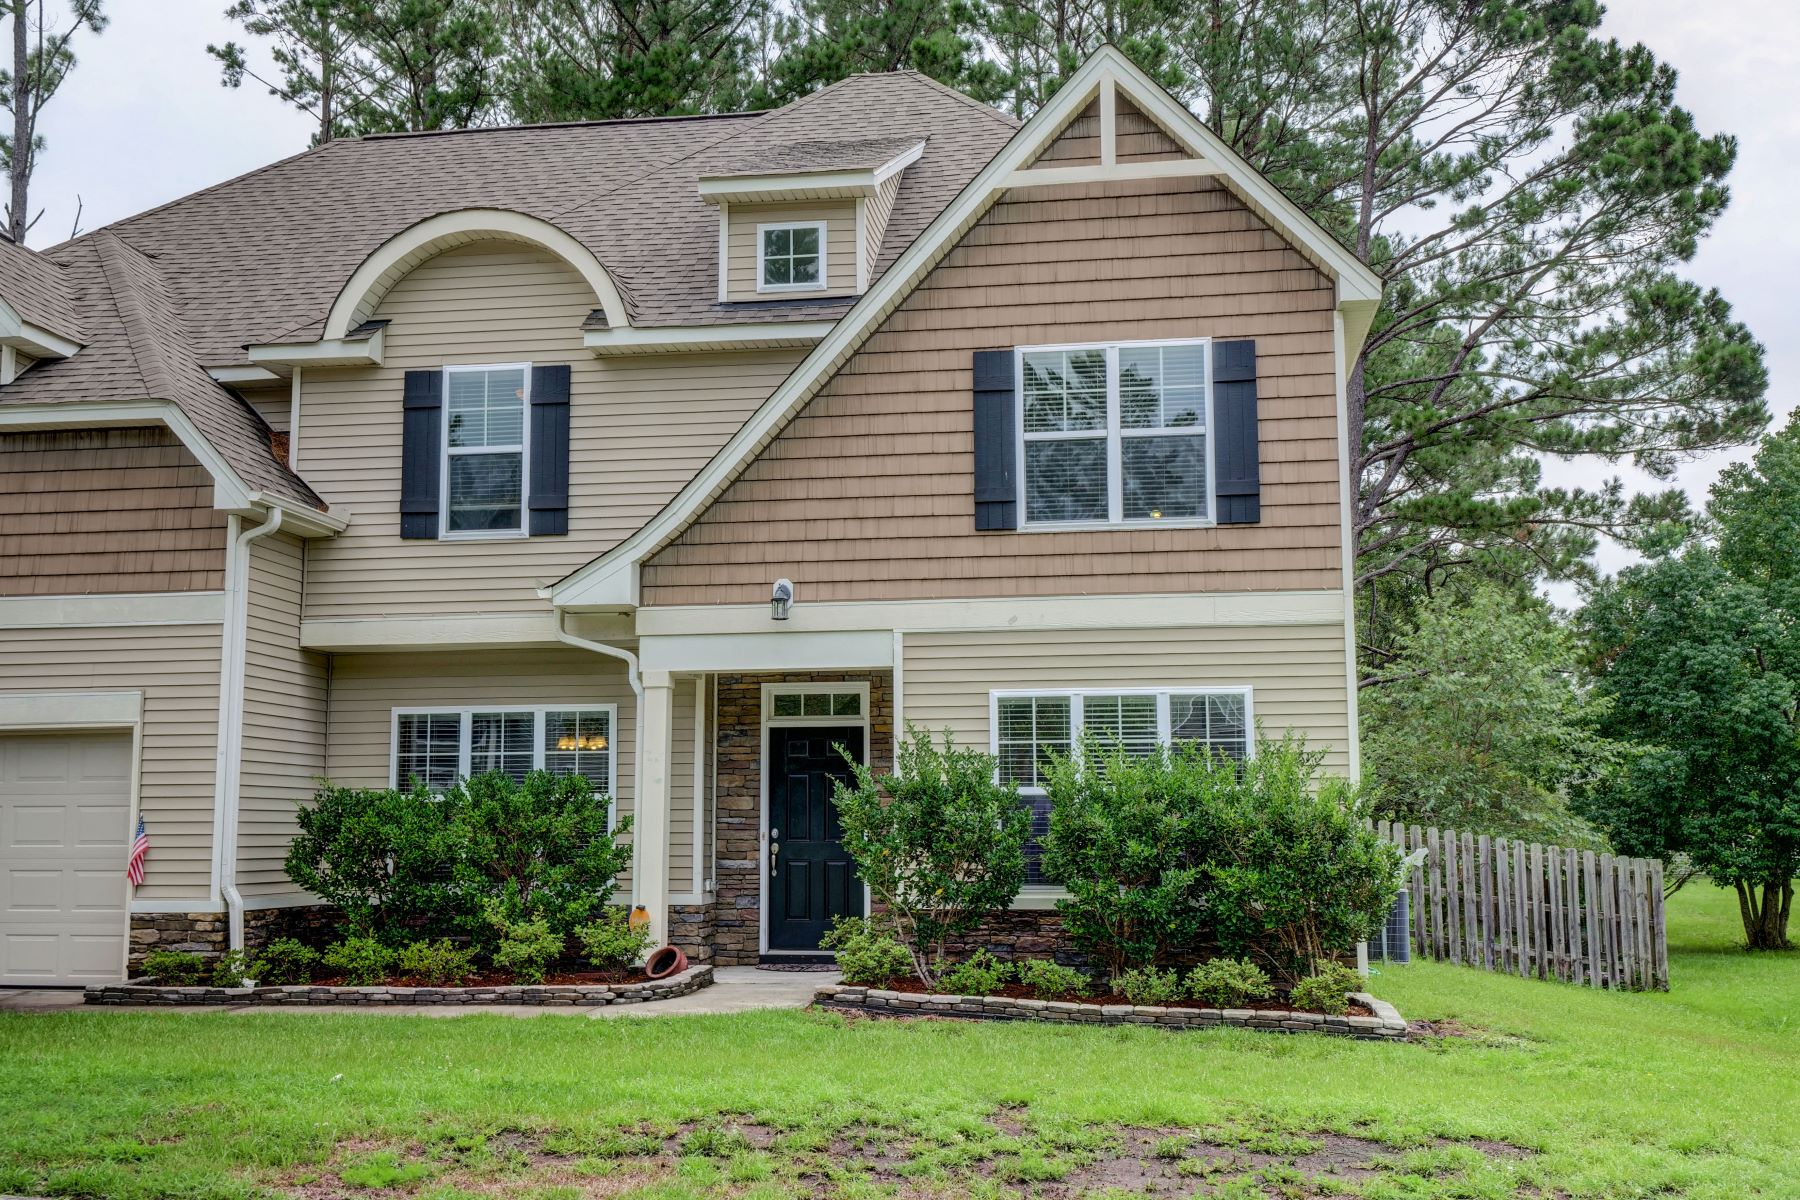 Single Family Homes για την Πώληση στο Savvy Home Close to Beach and Shopping 152 Cornel Lane, Hampstead, Βορεια Καρολινα 28443 Ηνωμένες Πολιτείες